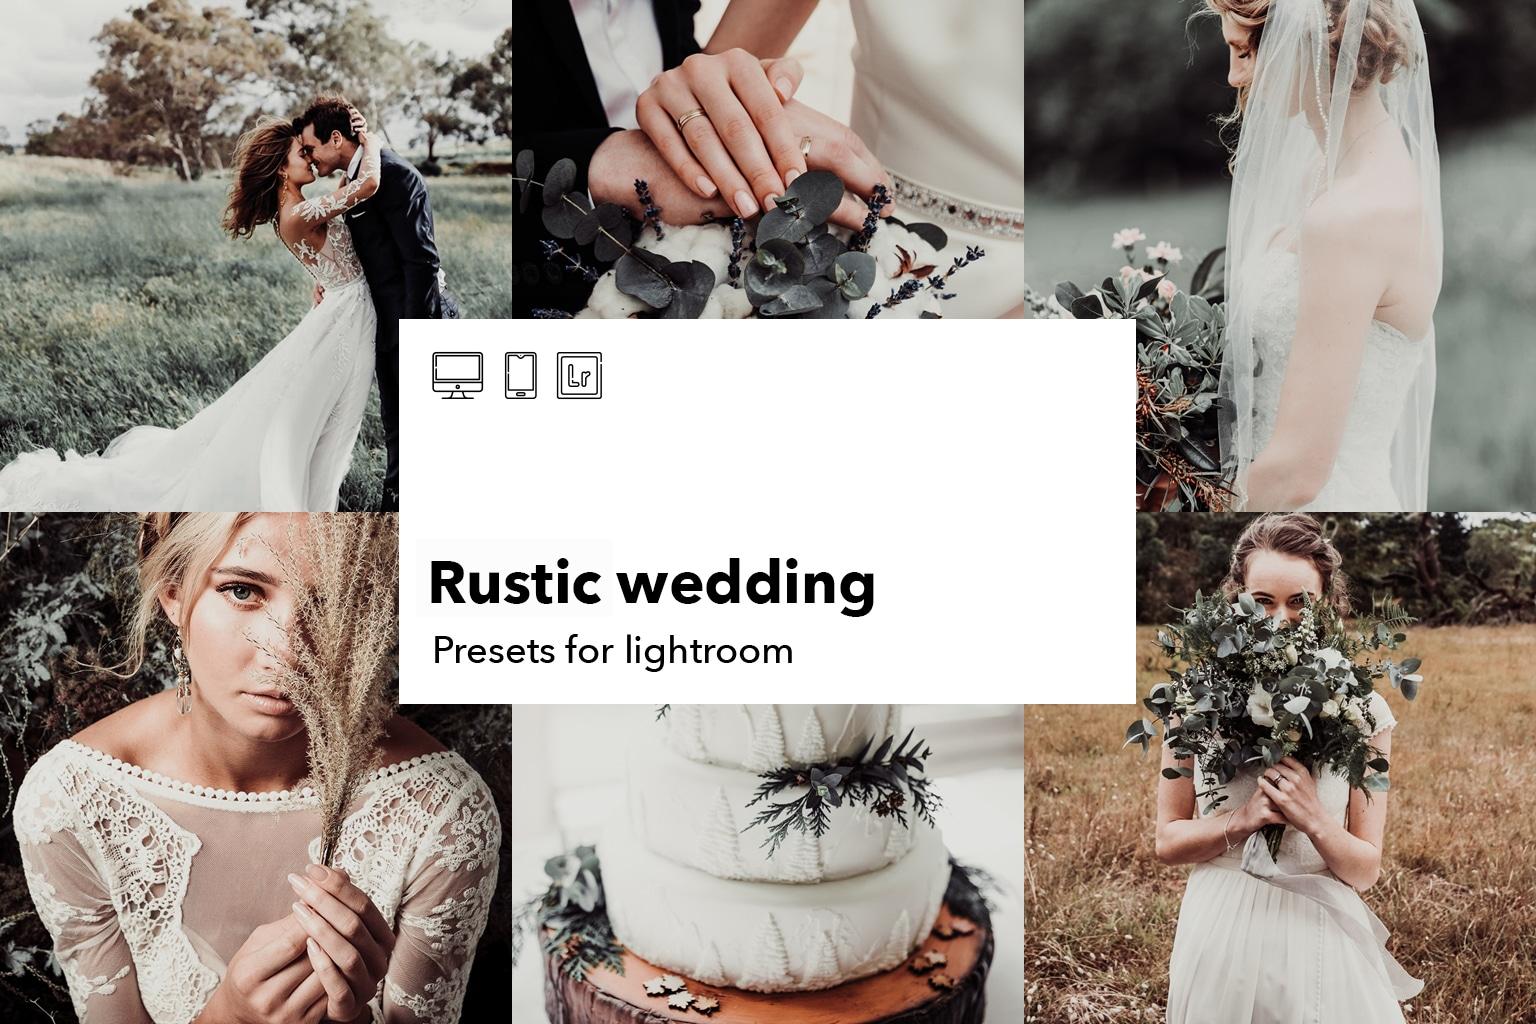 Rustic-wedding-cover